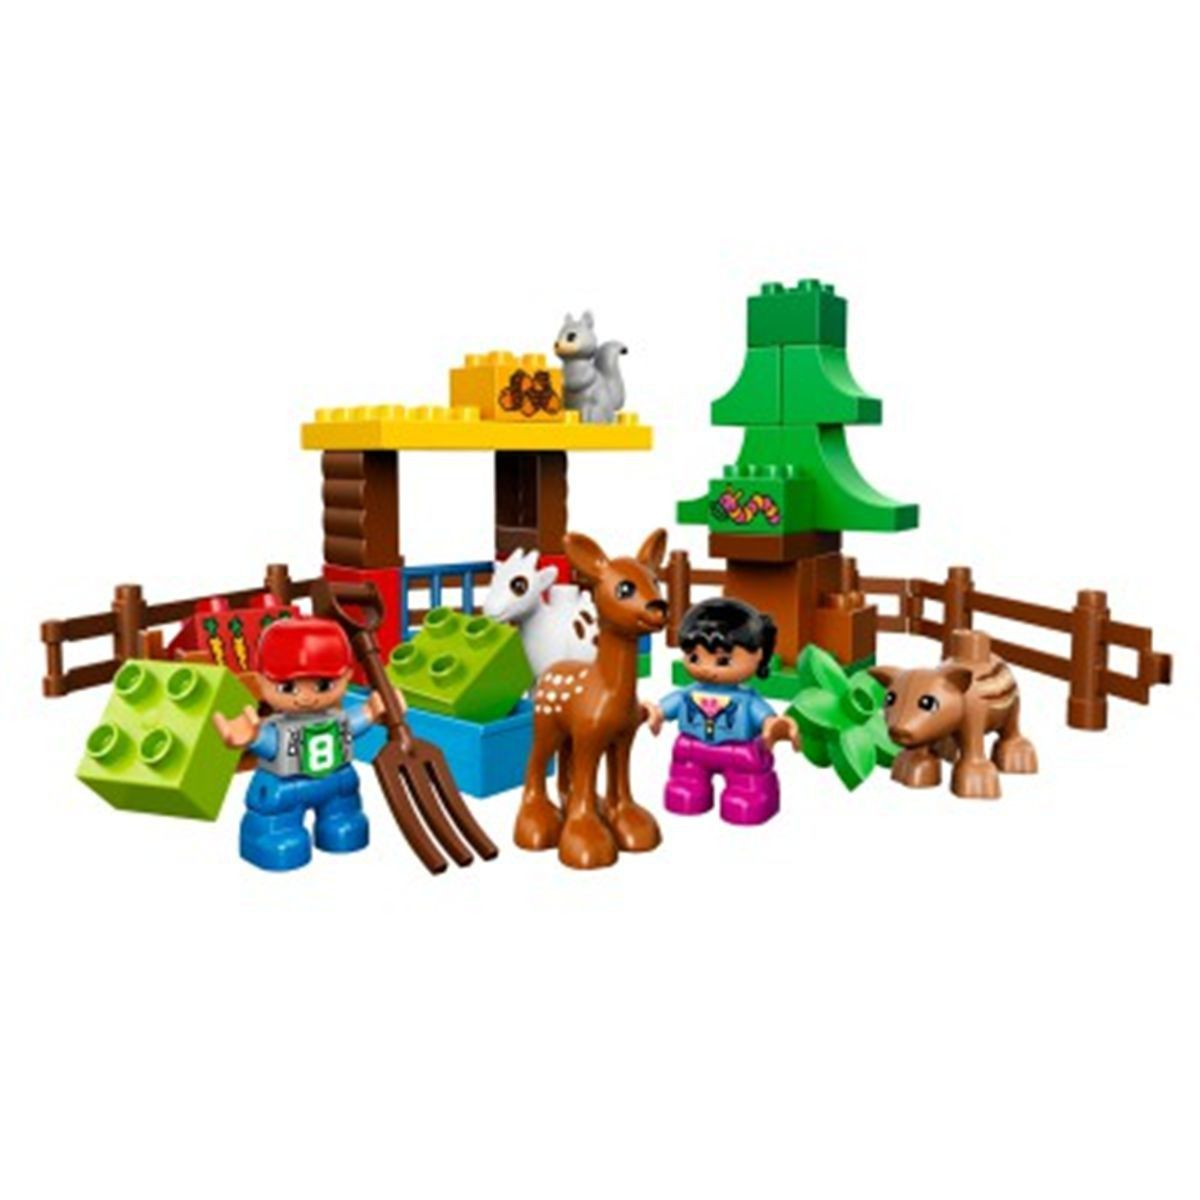 Wendy Et Lego FermeUnivers AnimauxJeux Pour Duplo Agricoles eQdCBroExW